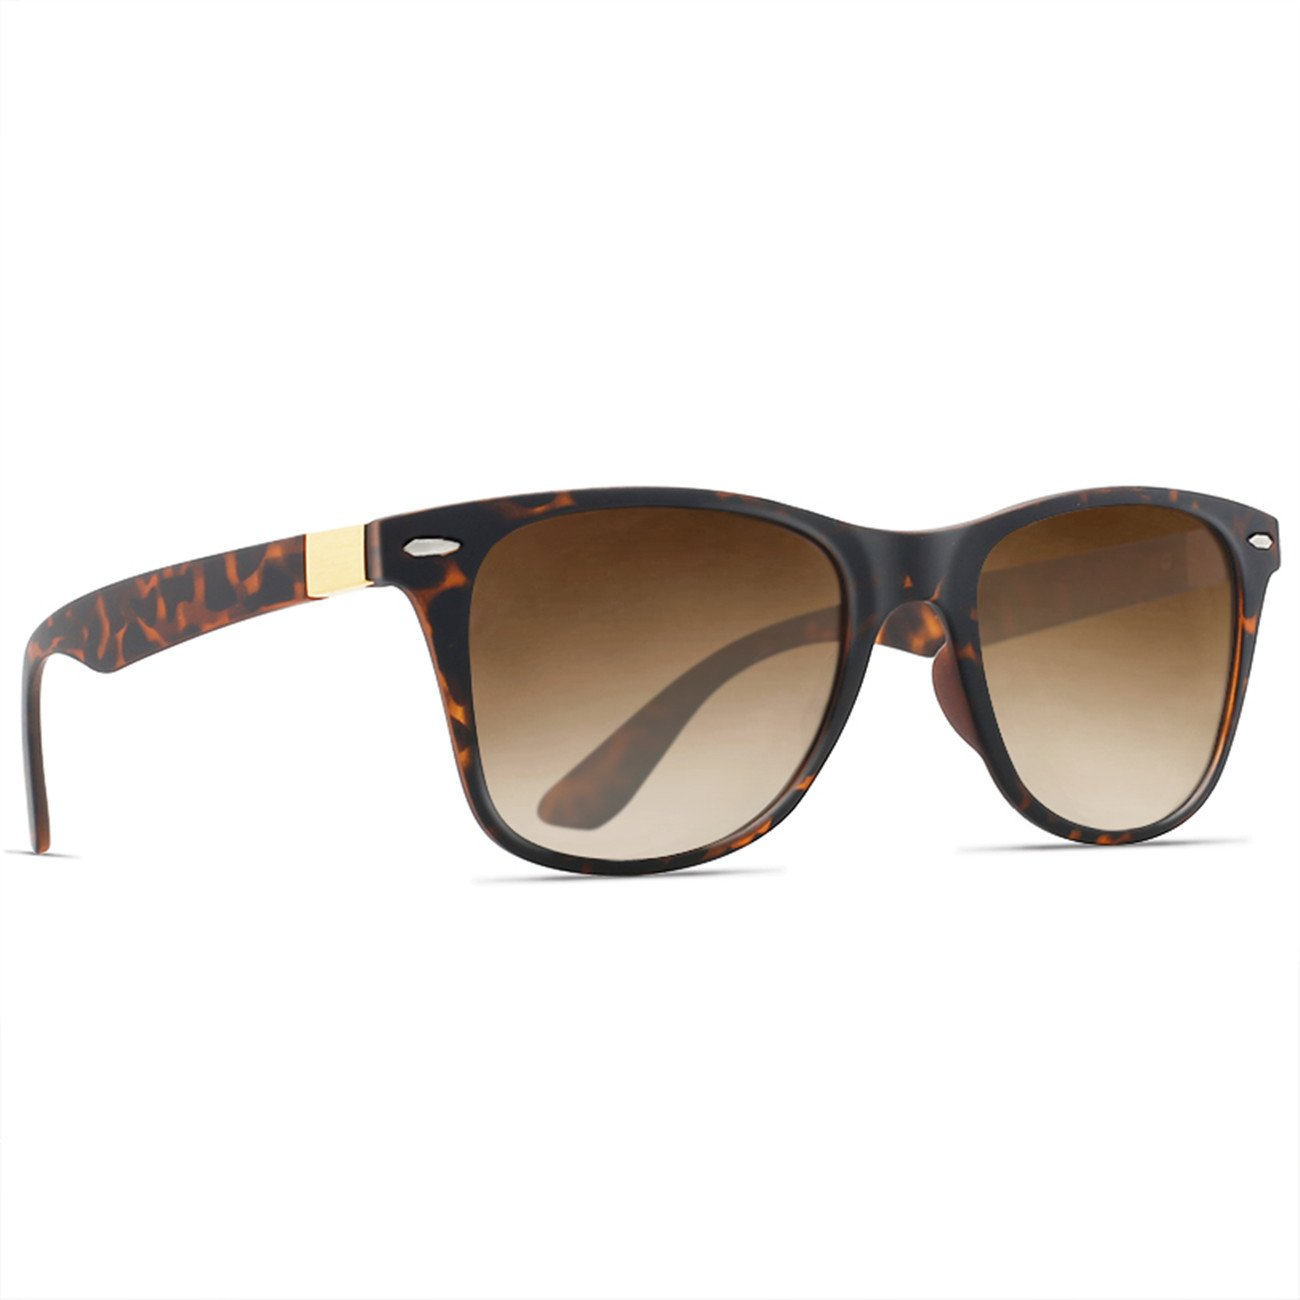 JULI Unisex Sunglasses Polarized for men women Classic Brand UV400 Protection TR90 P4195